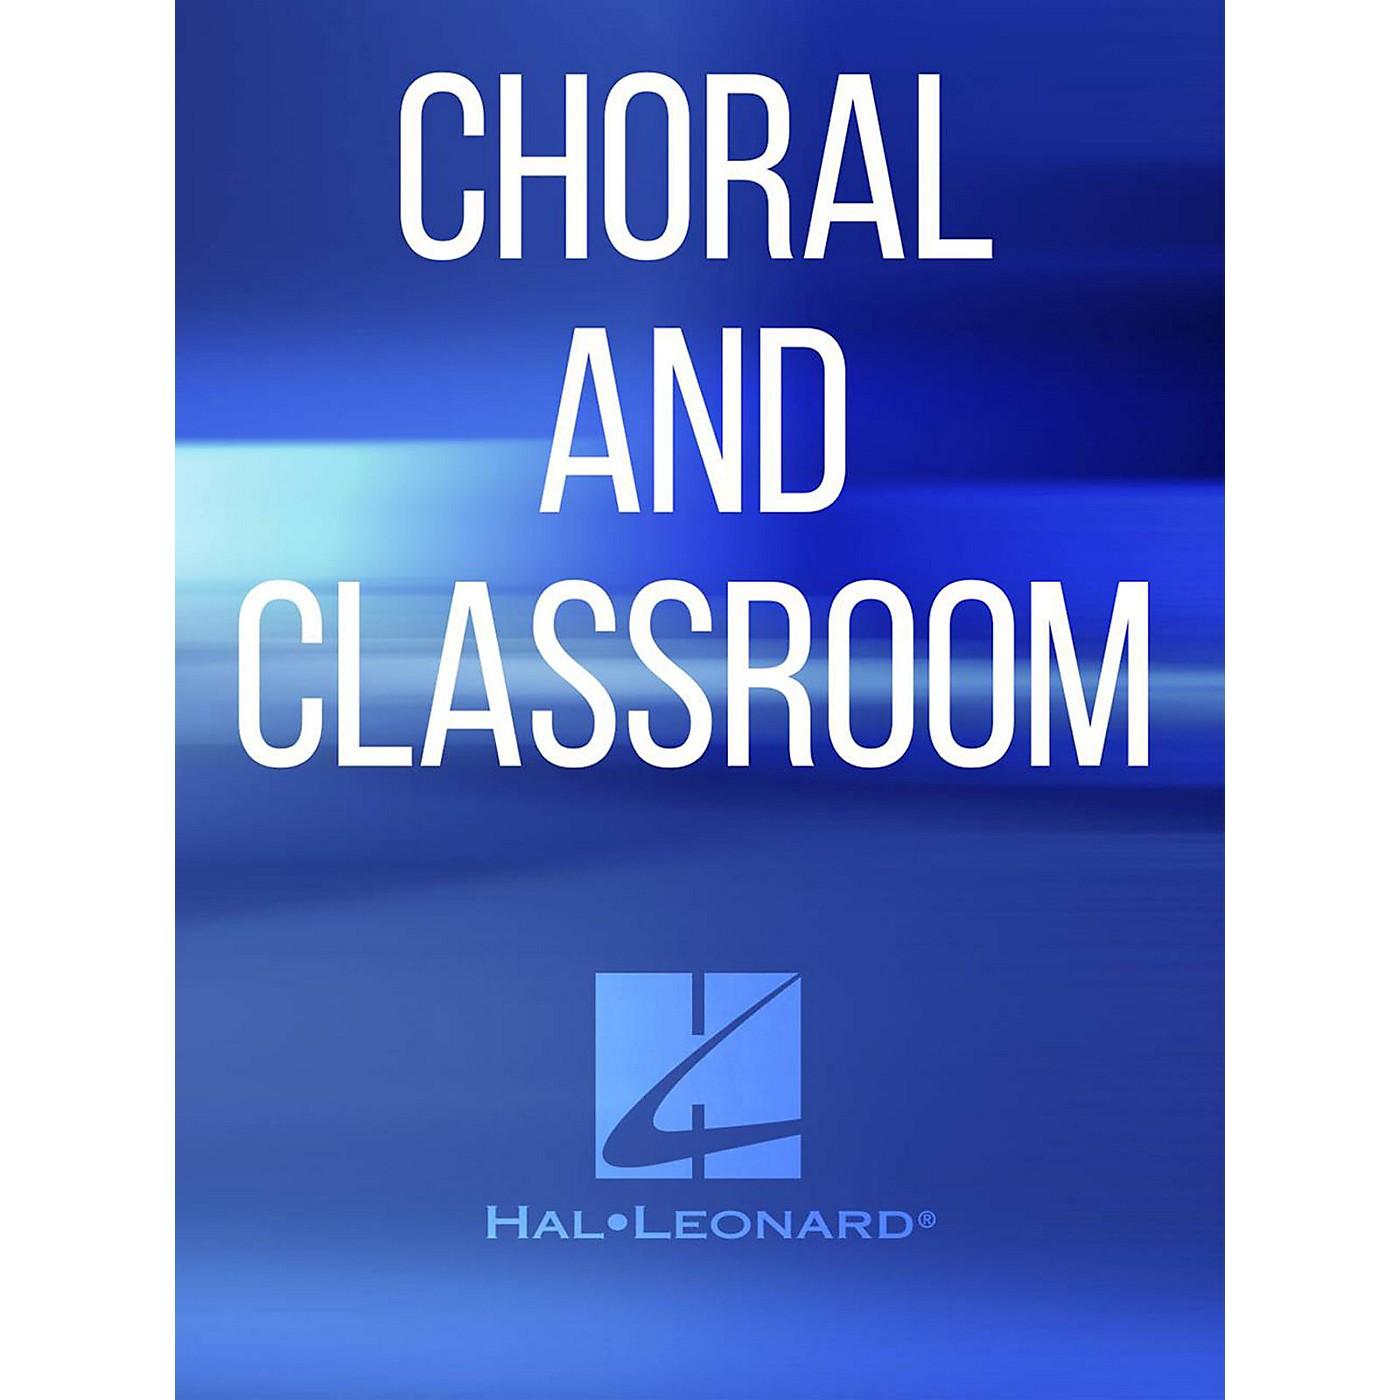 Hal Leonard Fotografia ShowTrax CD Arranged by Ryan James thumbnail